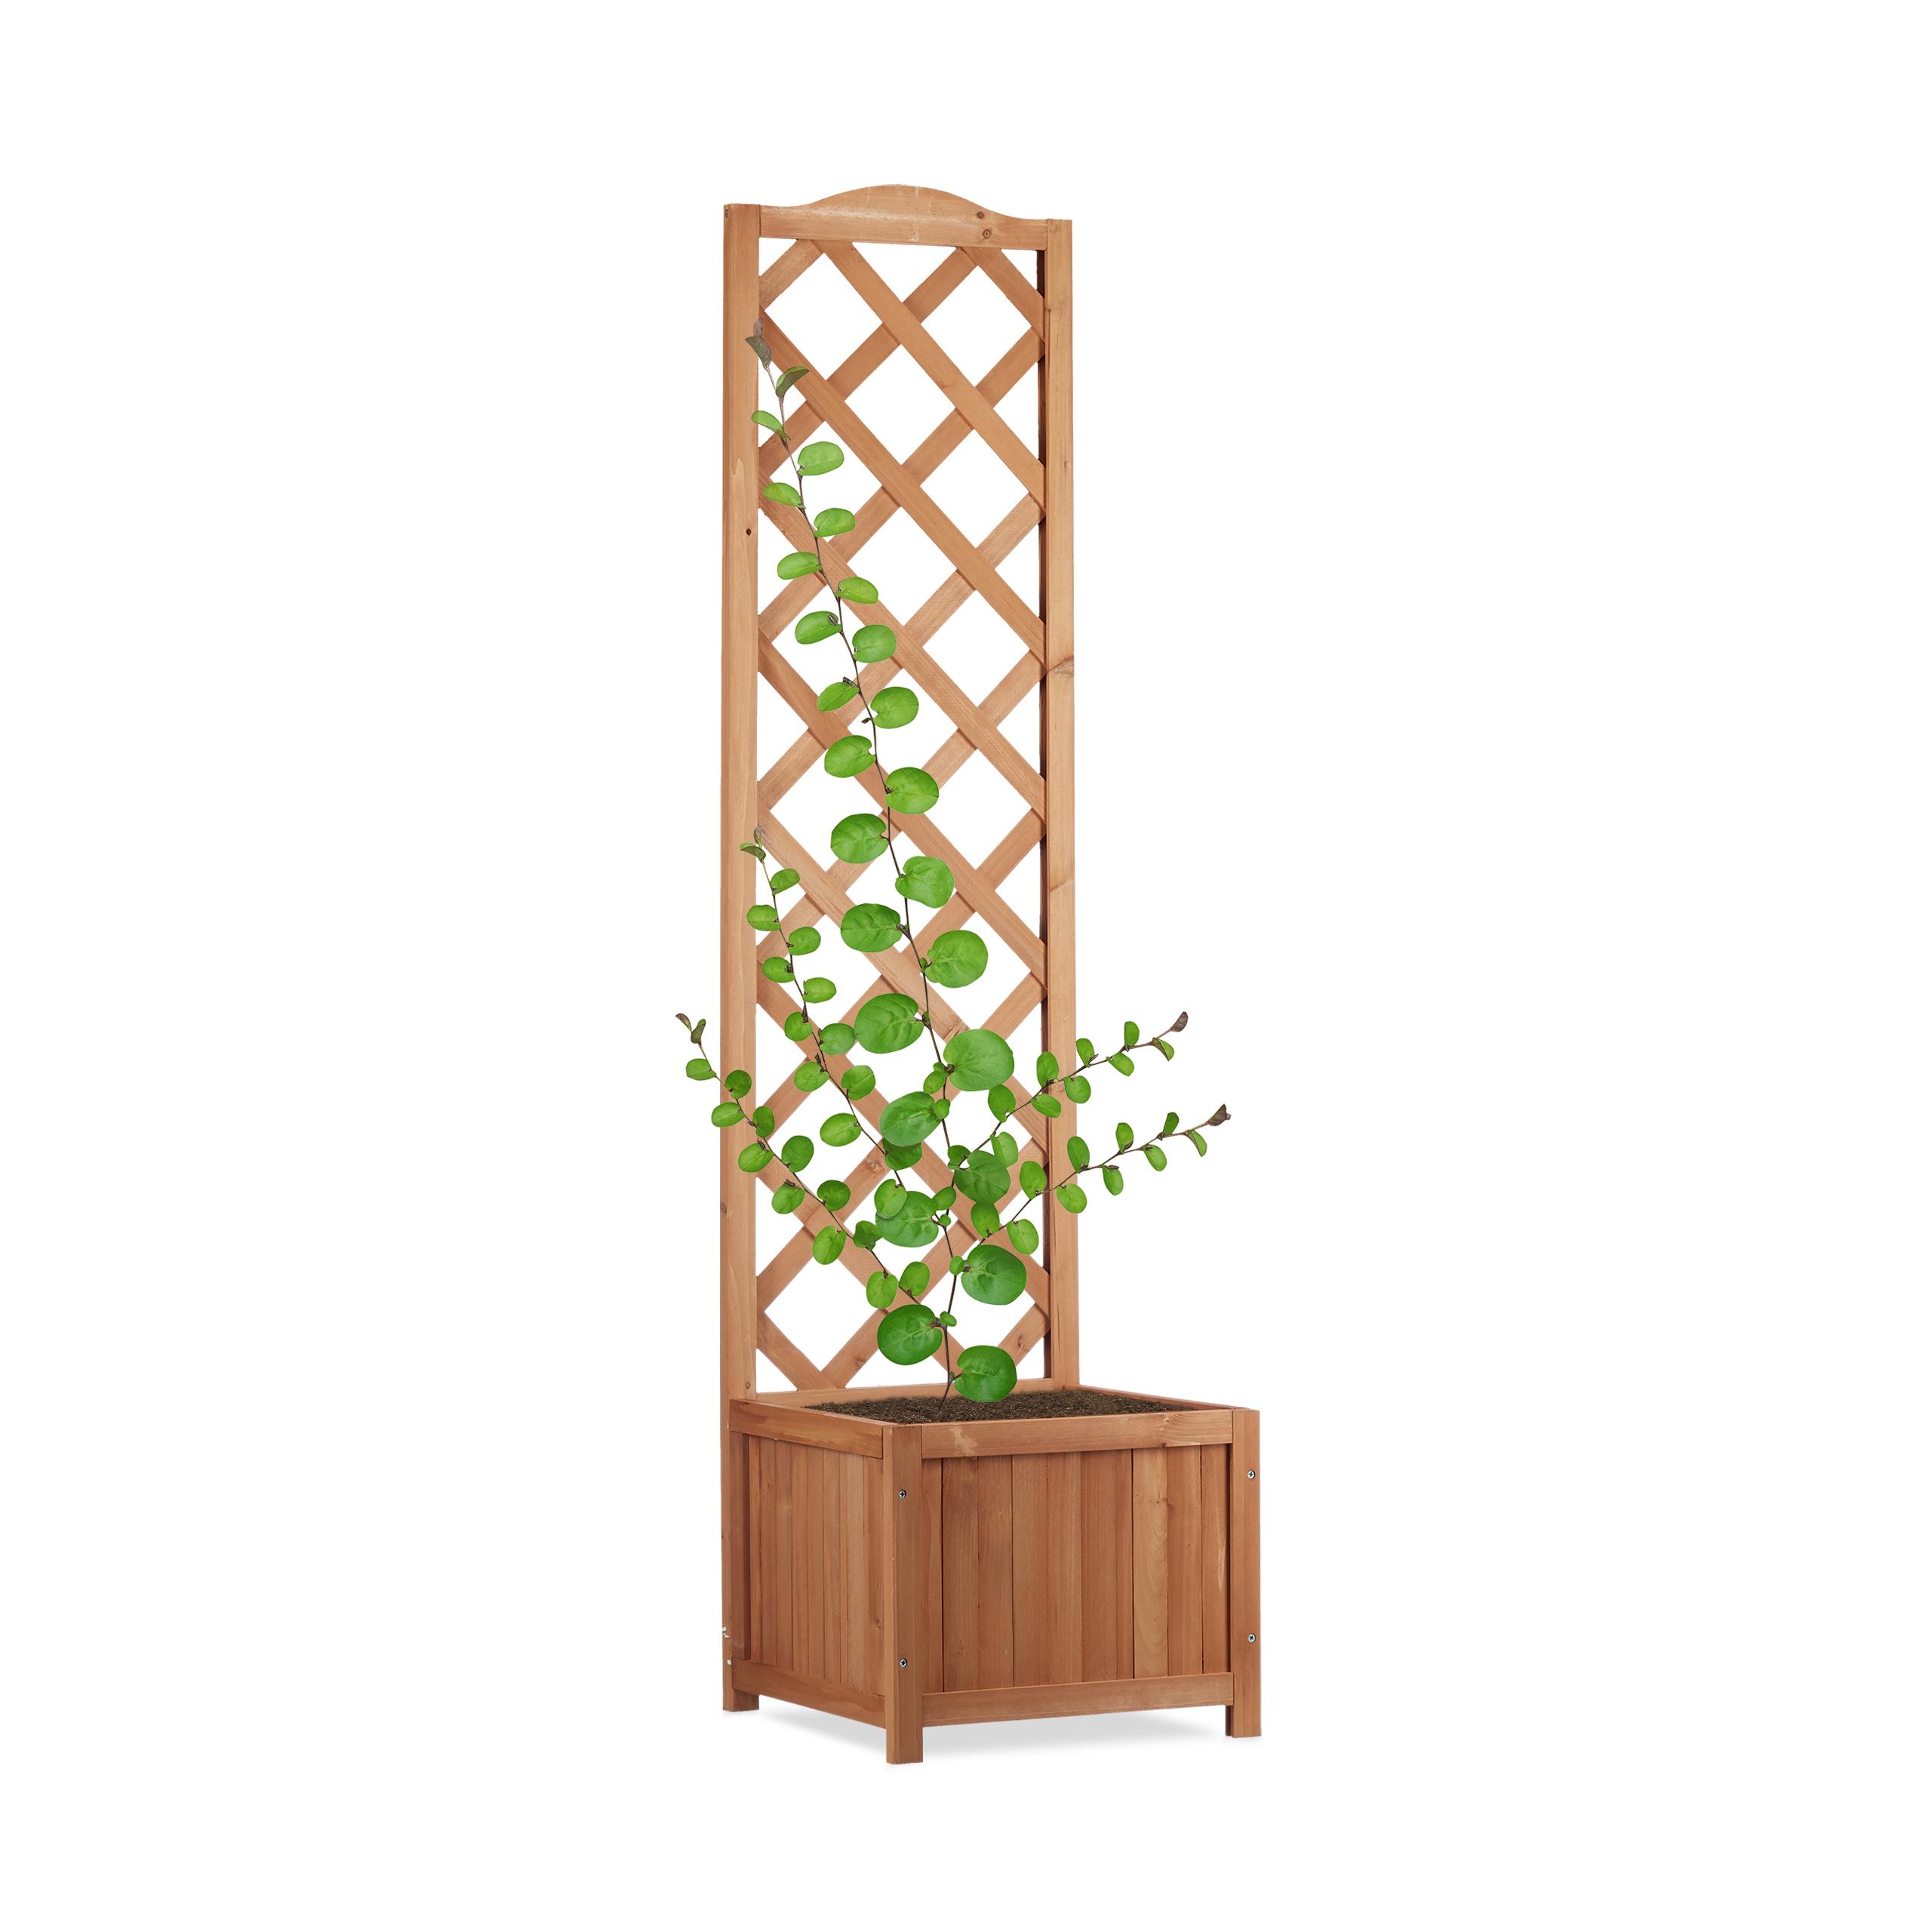 outdoor planter box with trellis weatherproof lattice. Black Bedroom Furniture Sets. Home Design Ideas